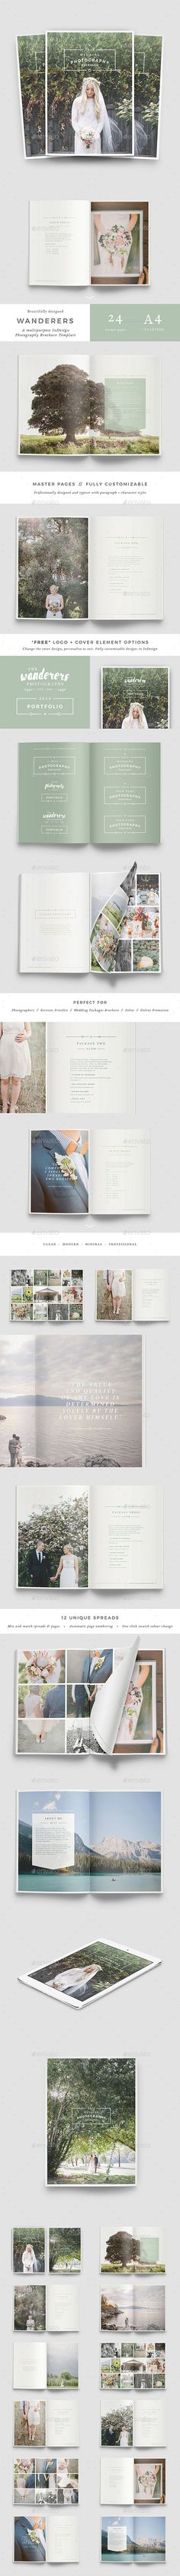 Wedding Photography Brochure — Indesign Template #minimalist #pricing  Brochure…